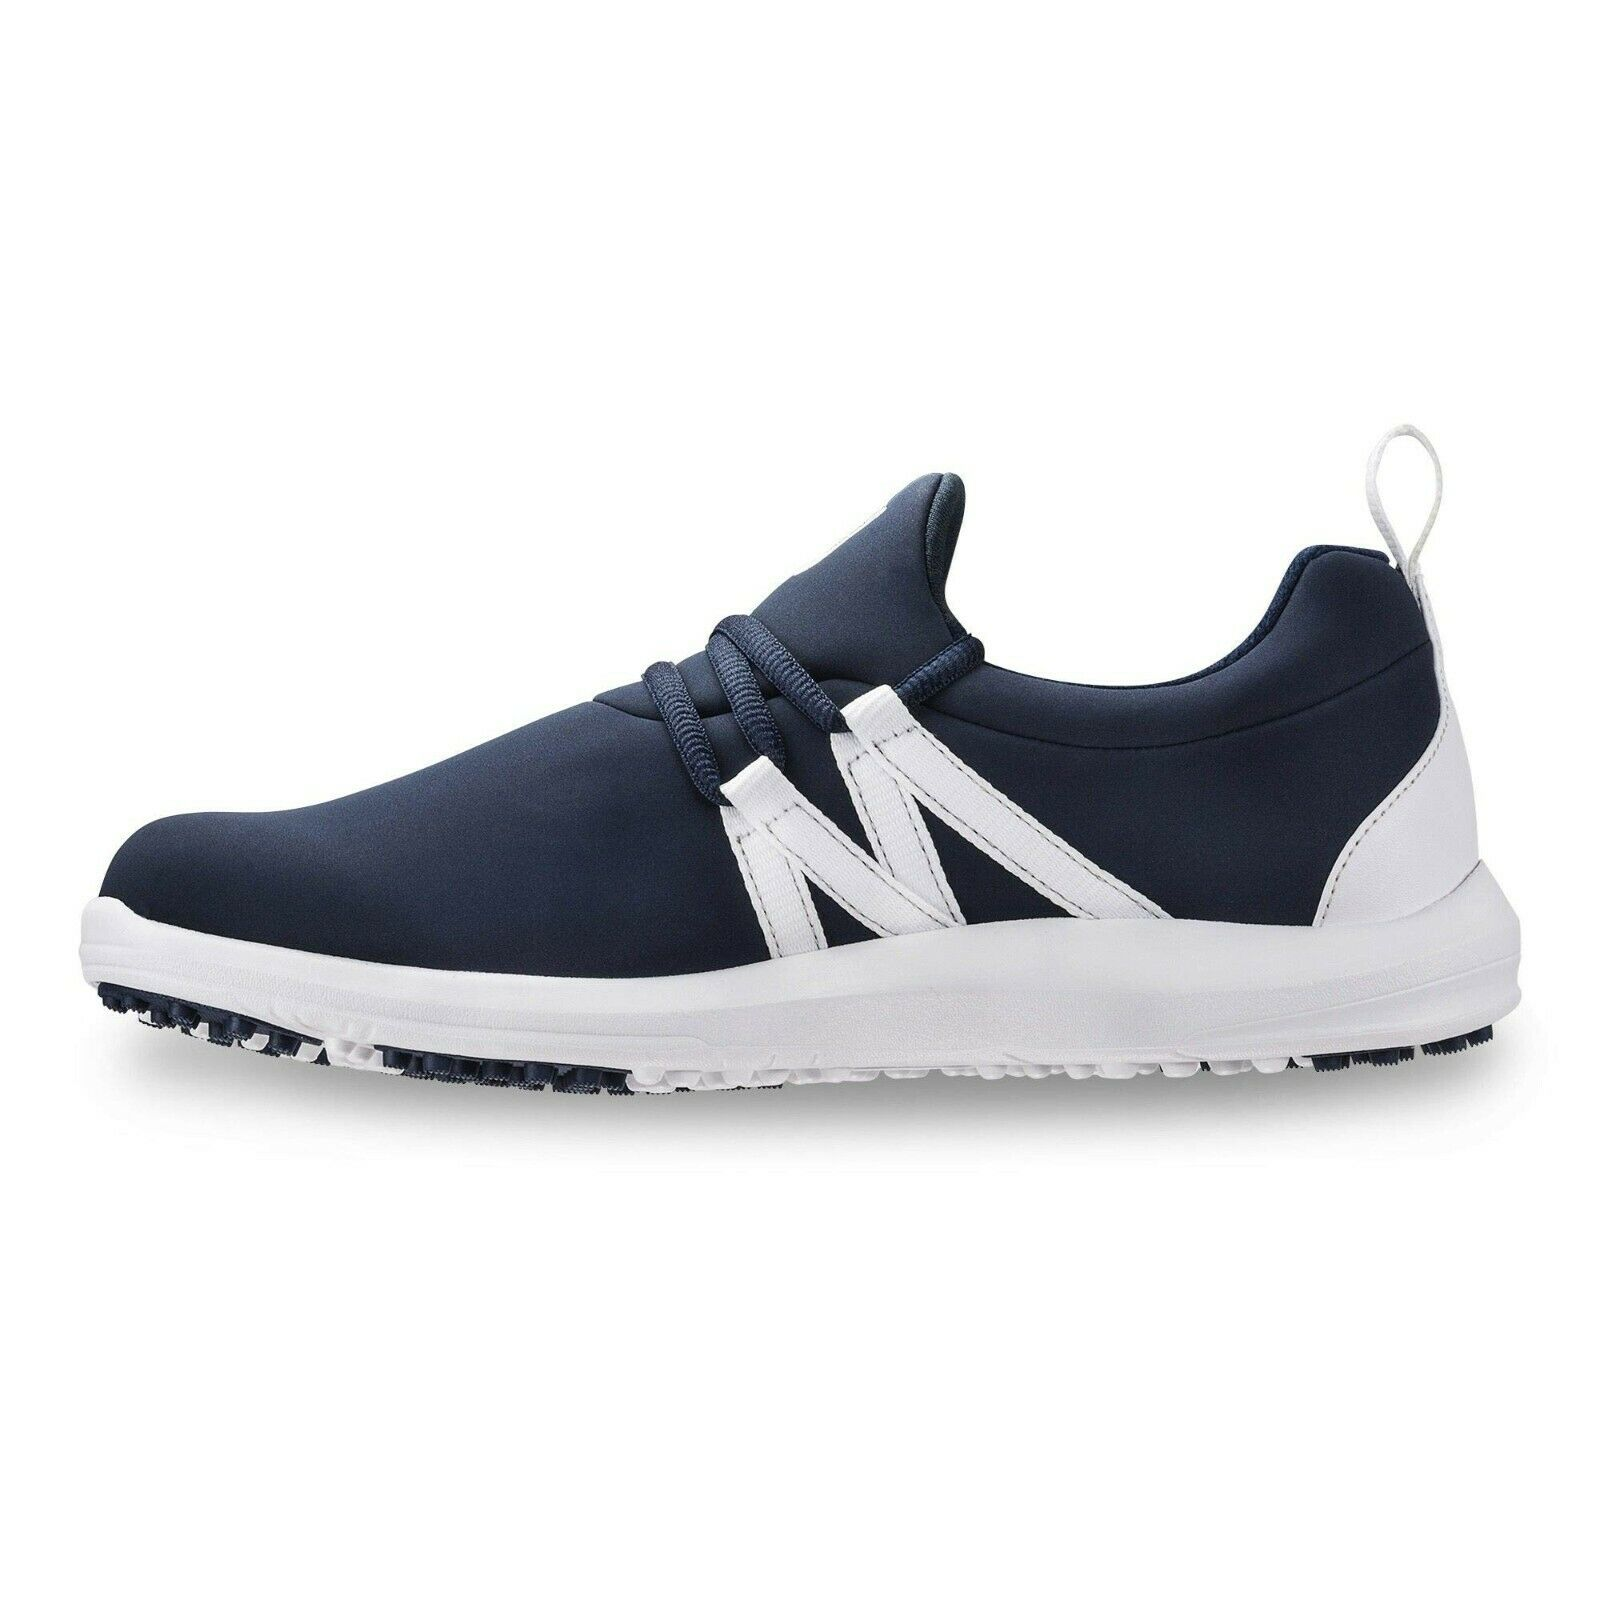 Brand New FootJoy Women's Fj Leisure Slip-on Golf Shoes - Choose Size 1